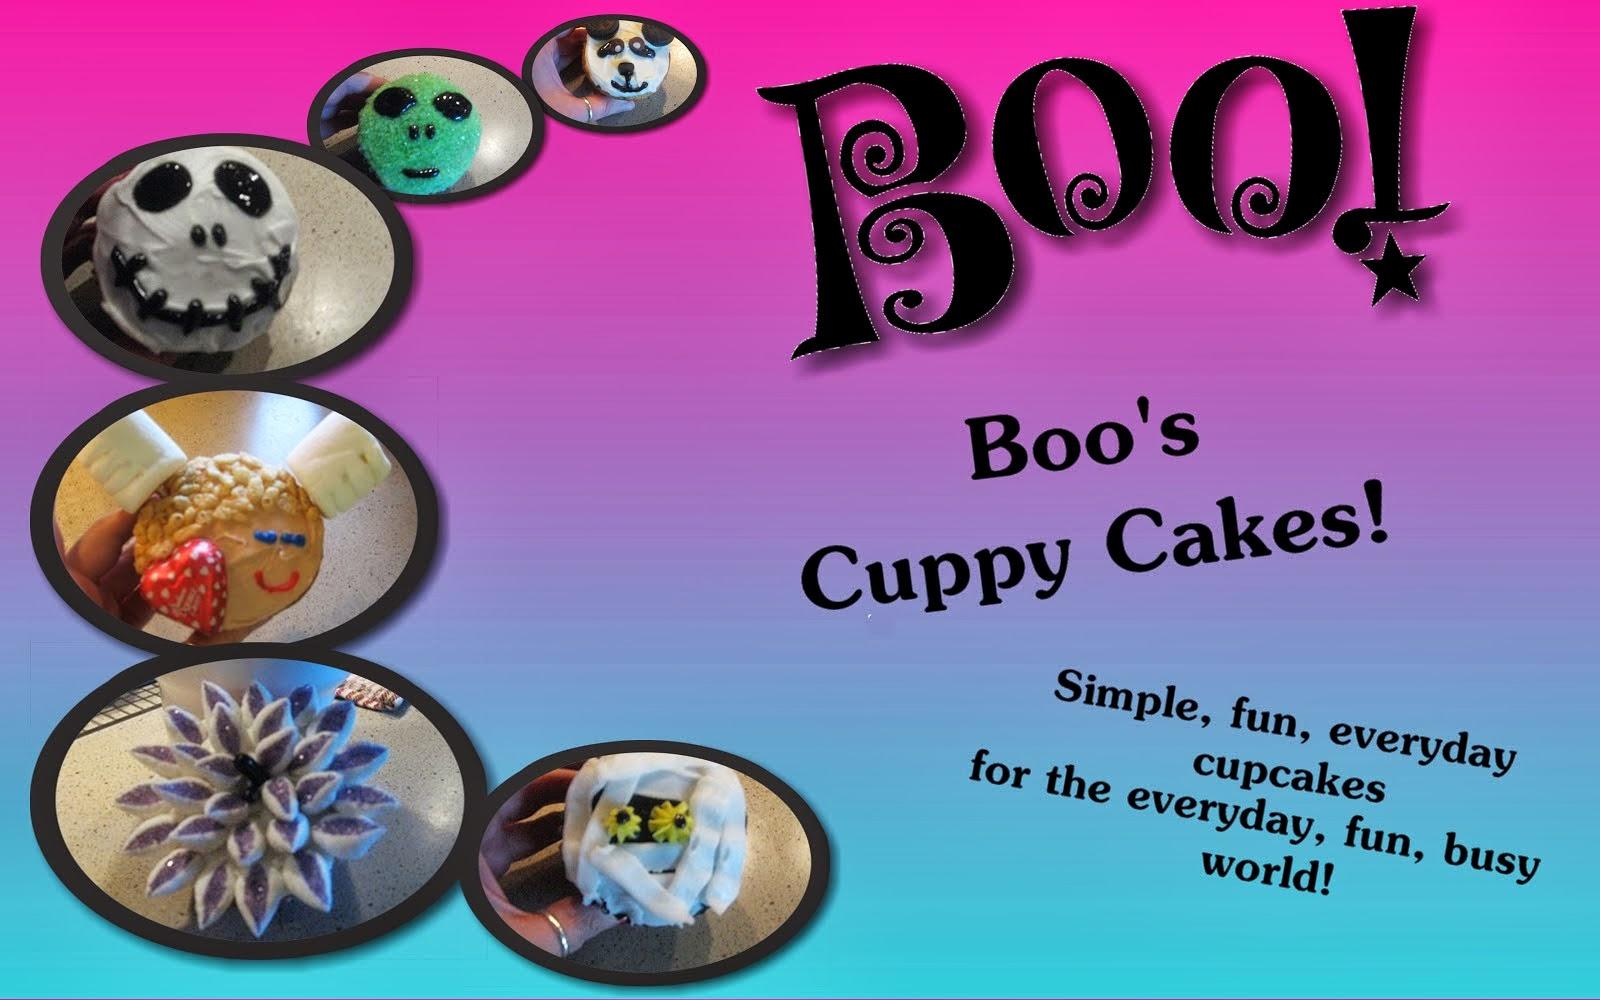 Kassi's Cupcakes